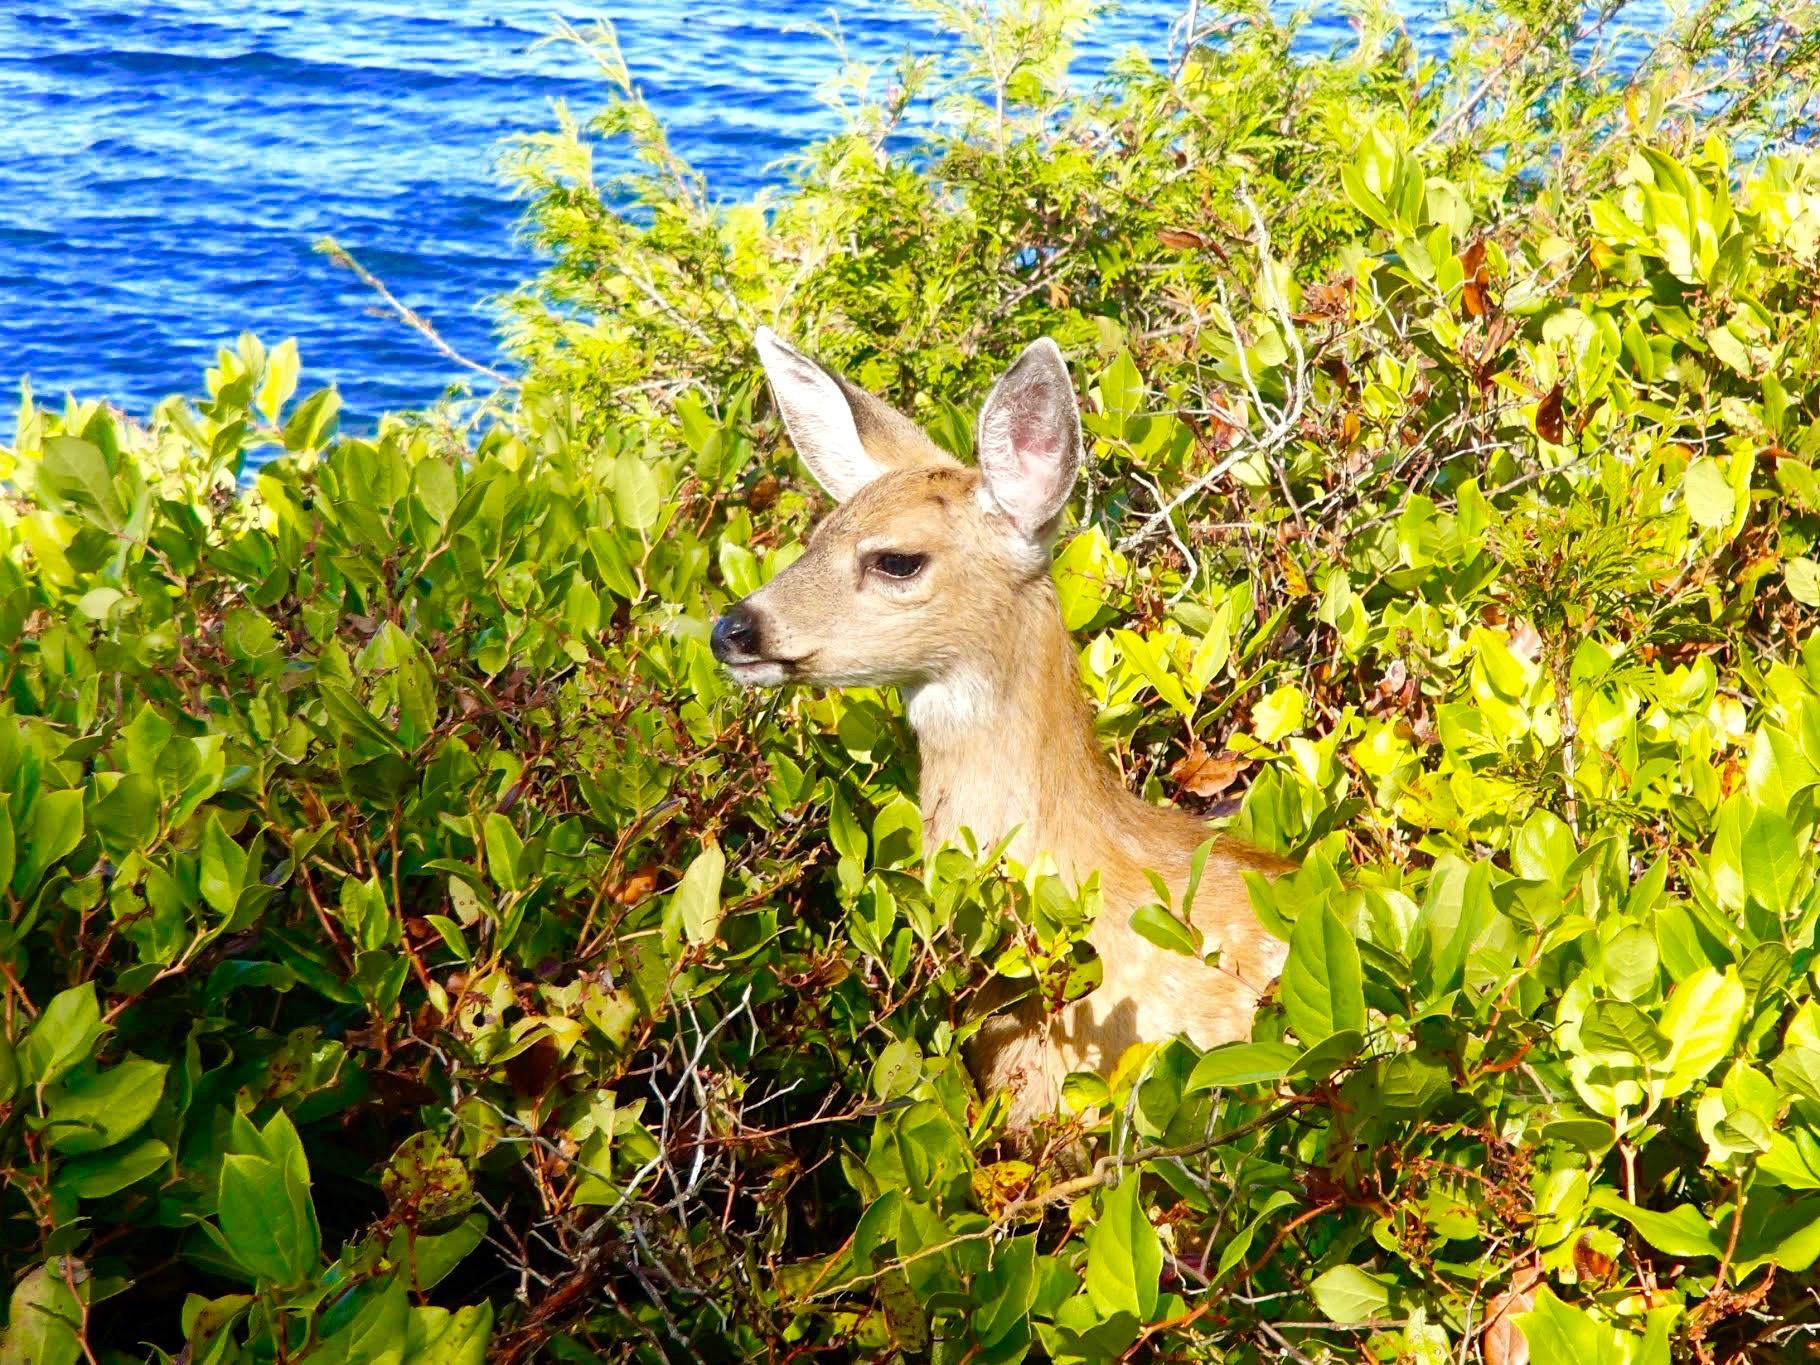 wildlife on Galiano island british columbia nature experience best family holiday destinations BC